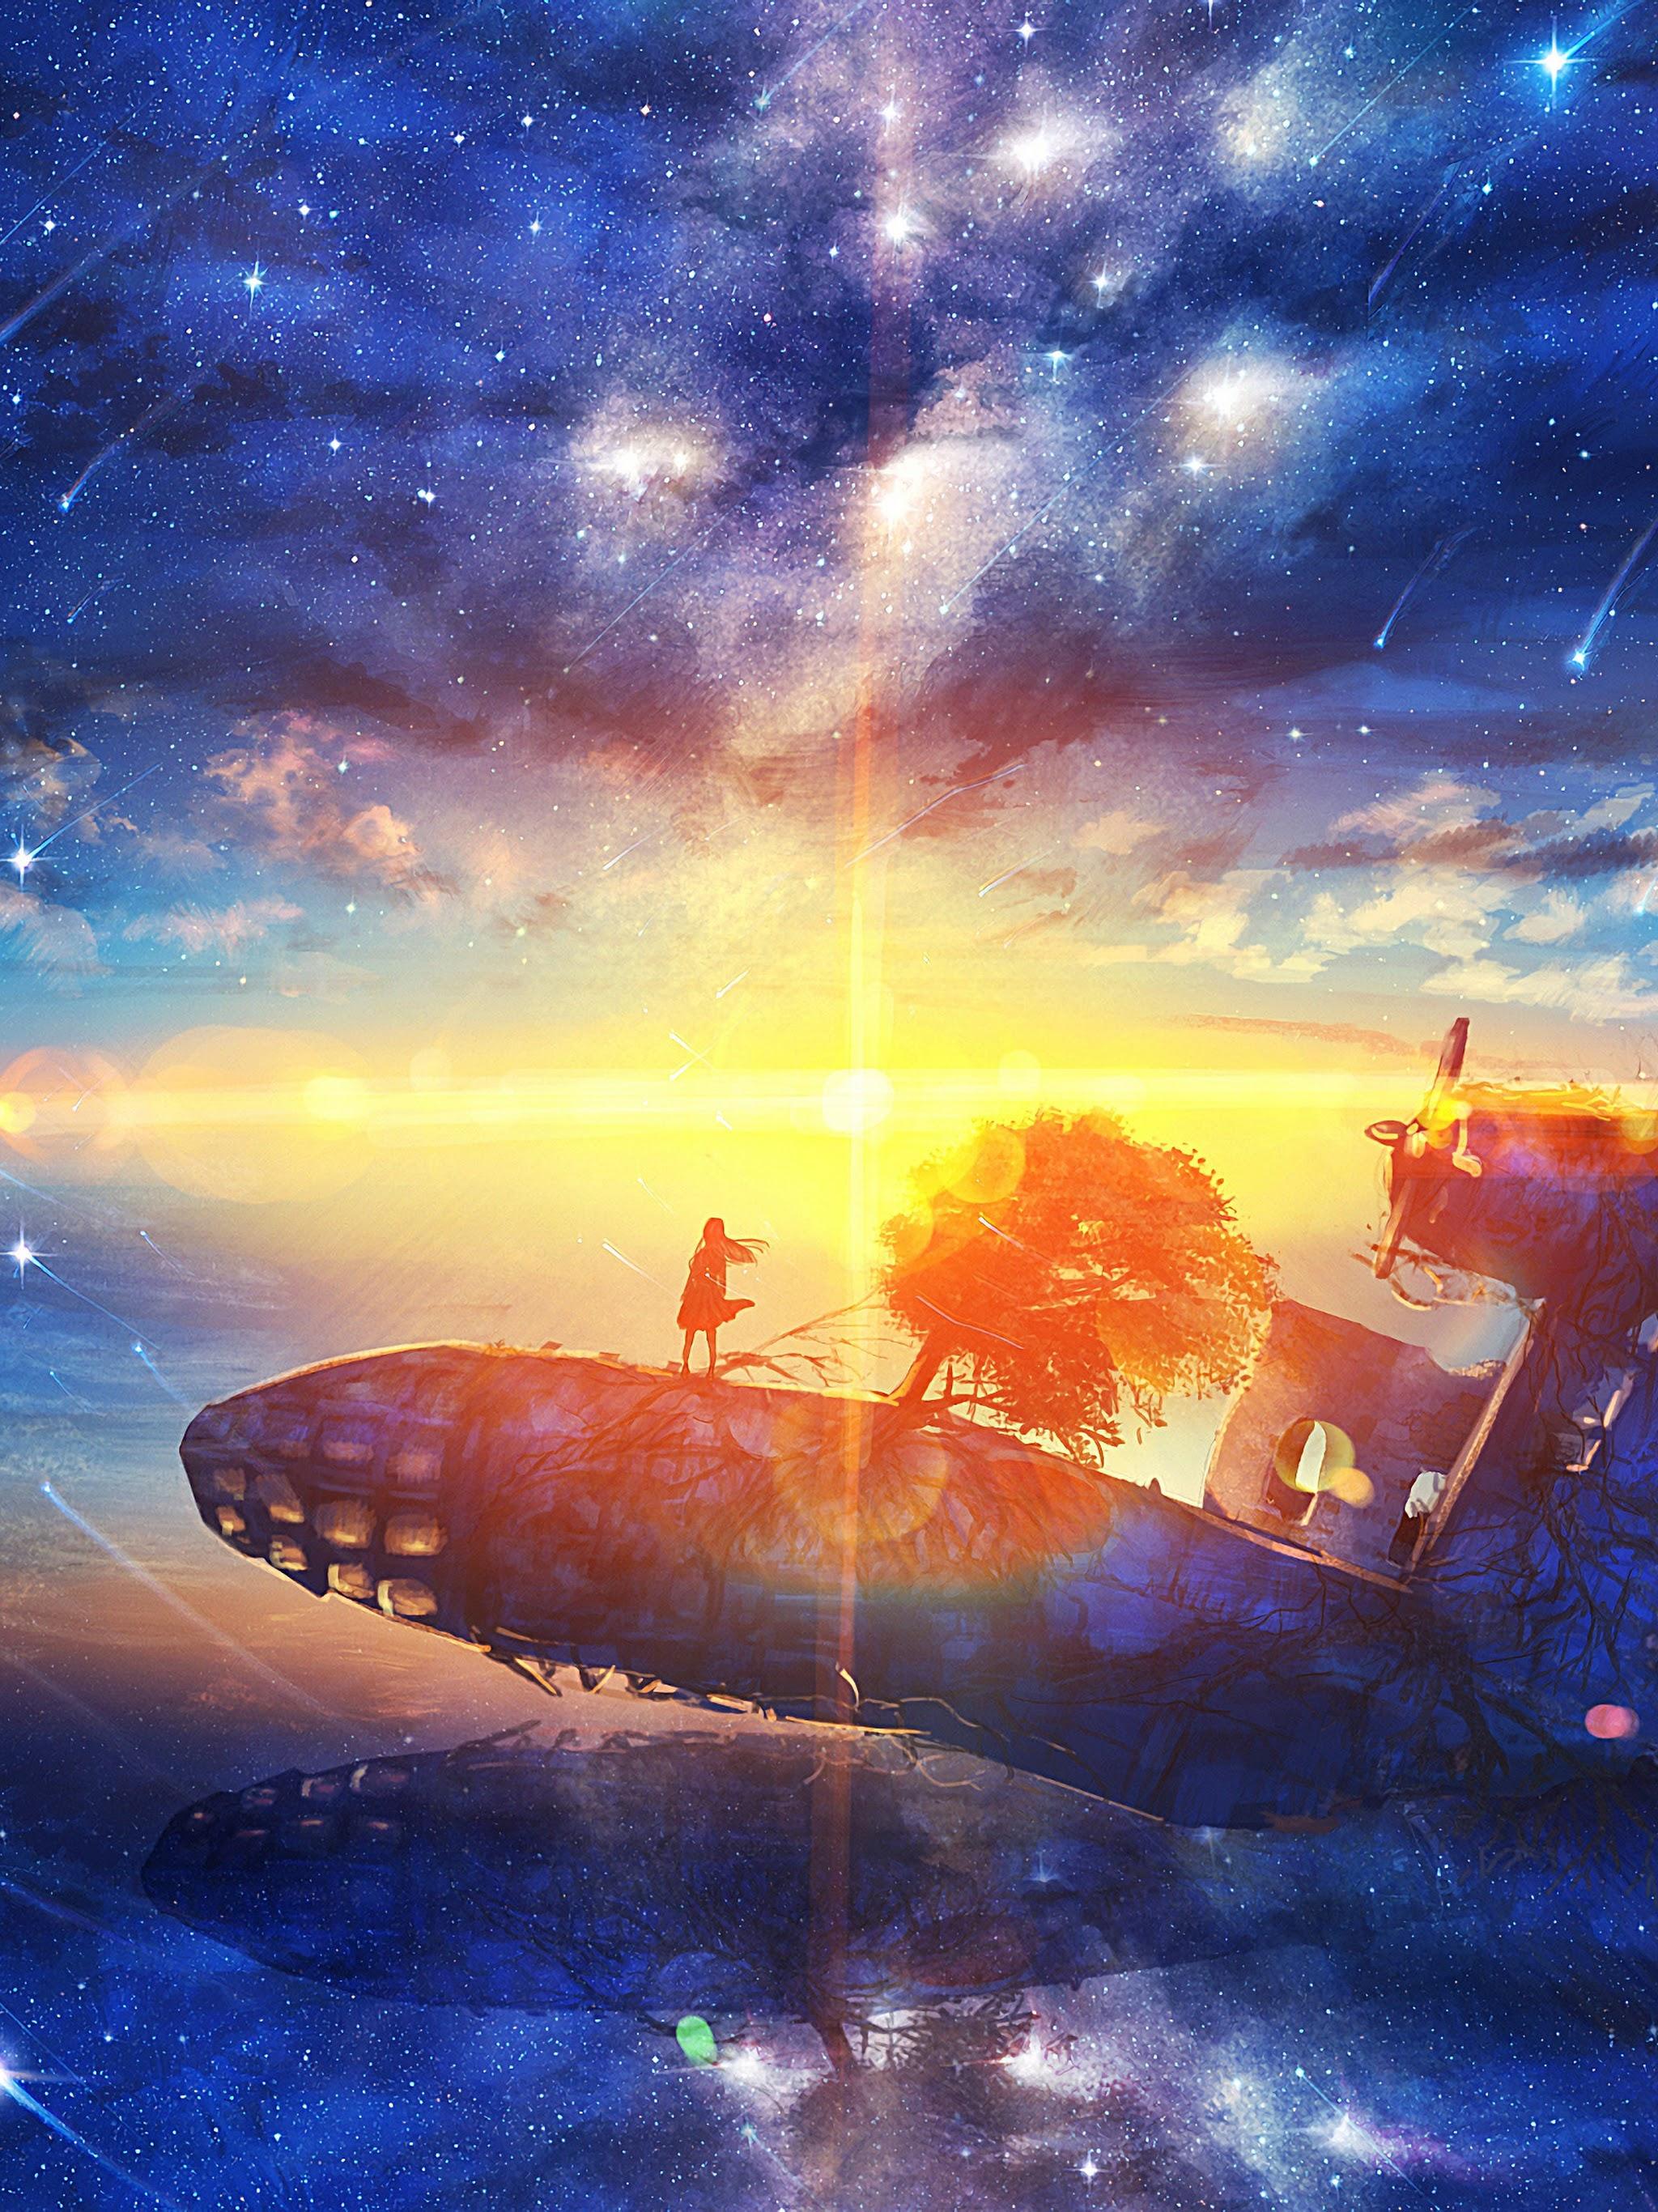 Sunrise Anime Scenery Horizon Stars 4k Wallpaper 181